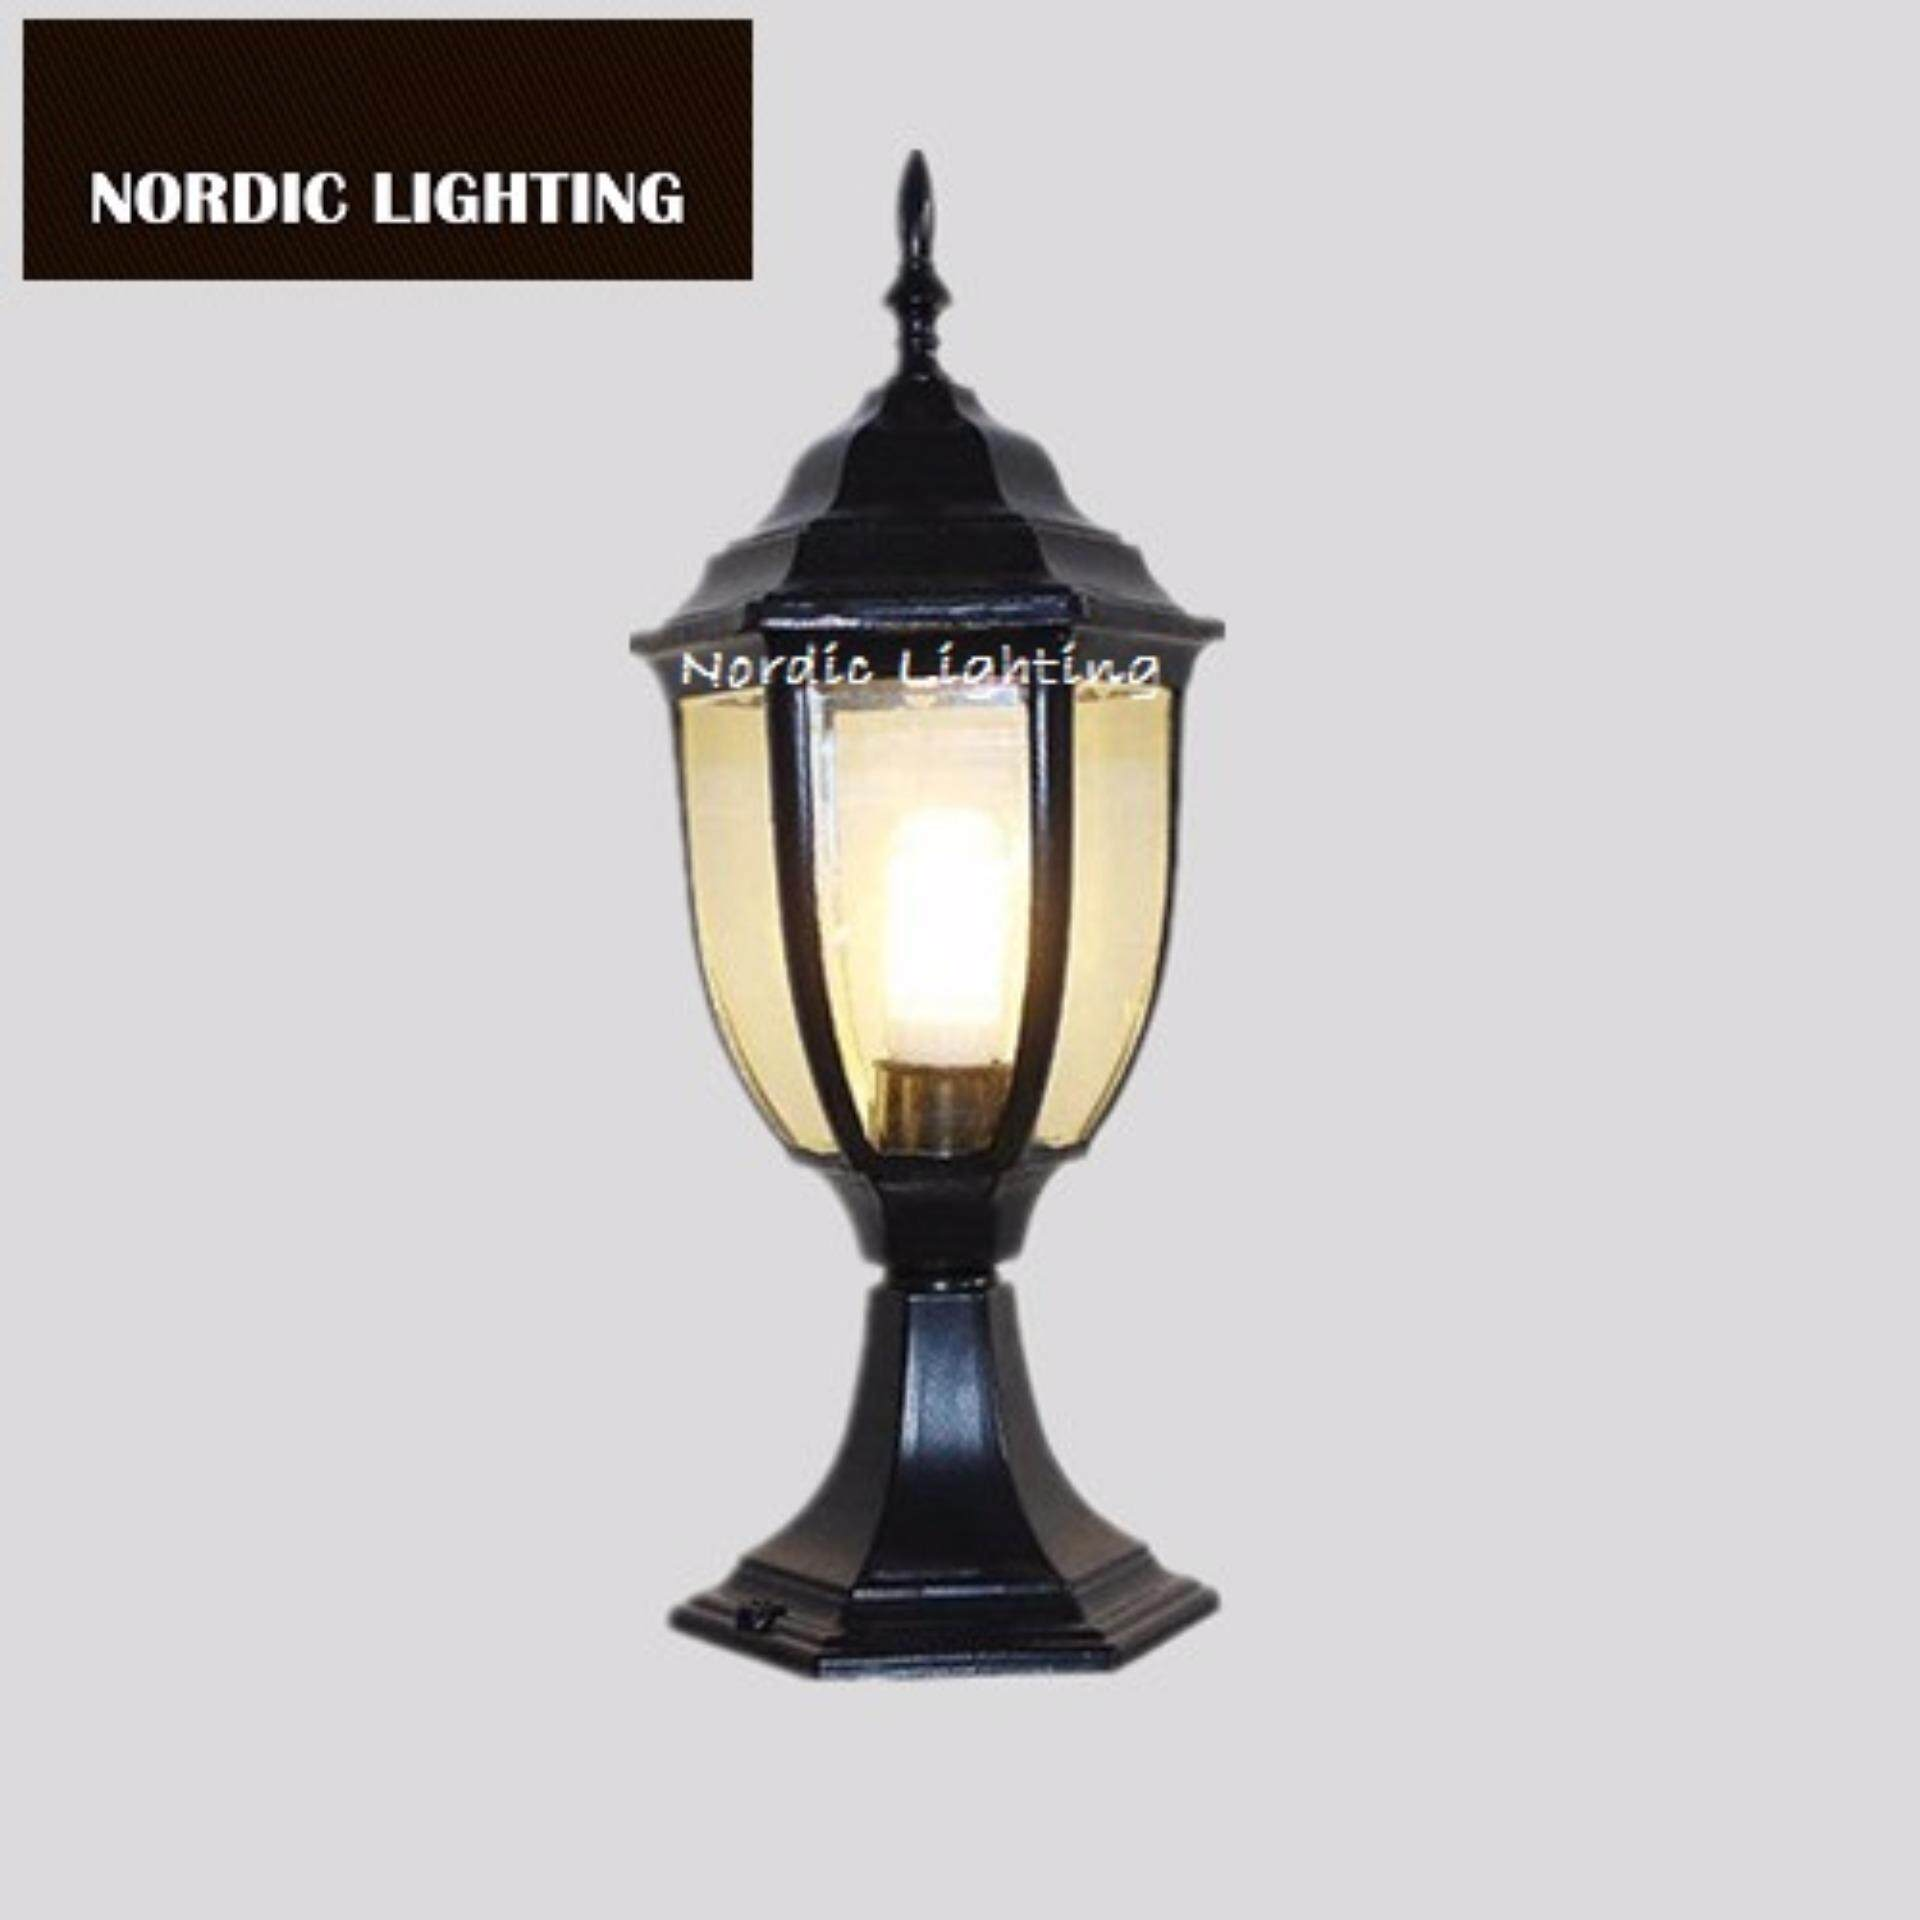 nordic simple orb clear glass pendant lighting. Nordic Lighting. Buy S Size Black Industrial Outdoor Gate Light Lighting Best Seller Pillar Simple Orb Clear Glass Pendant